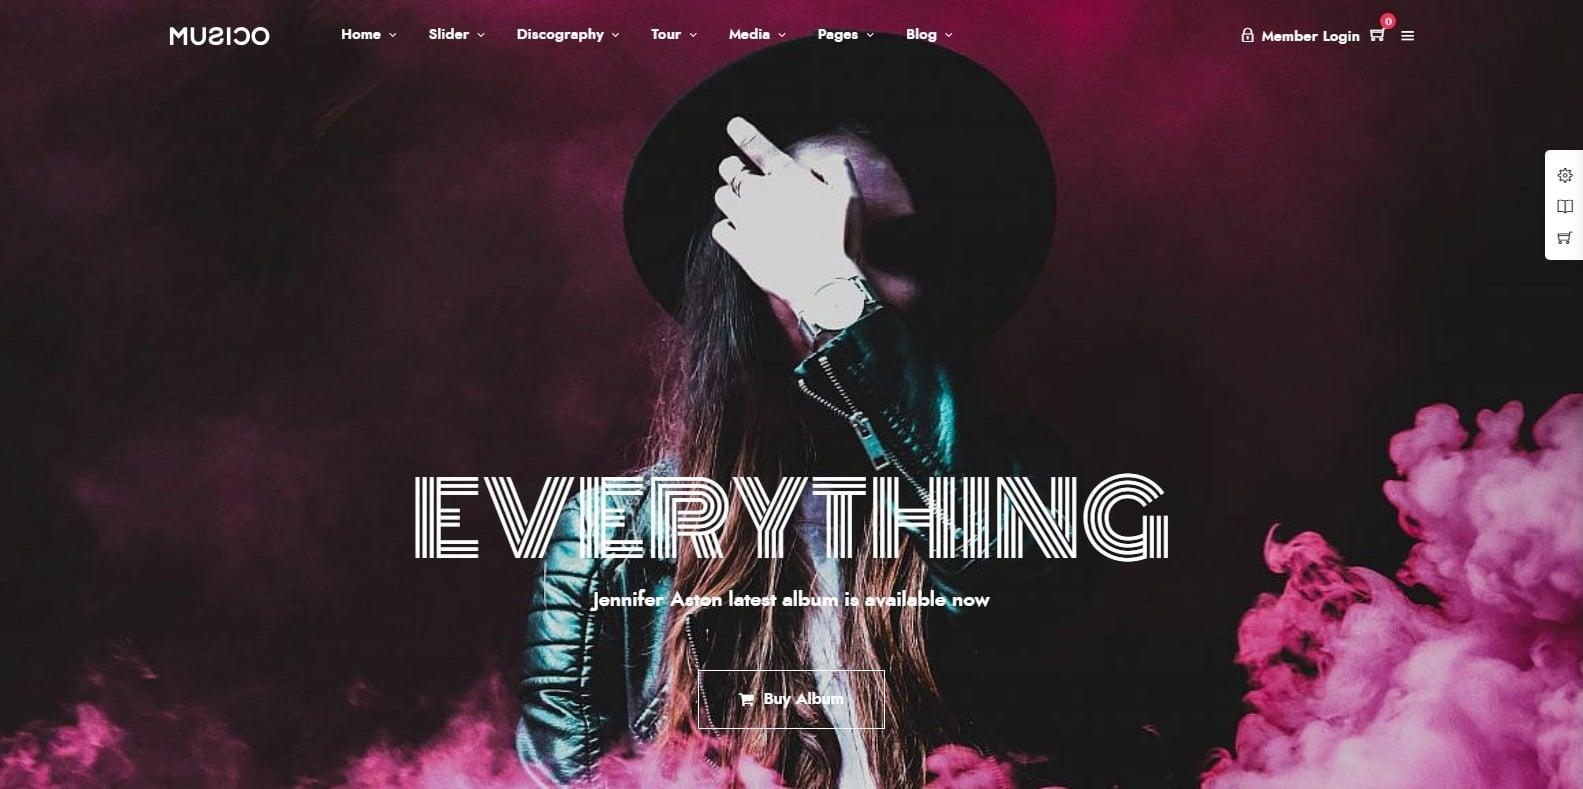 musico-html-music-website-template